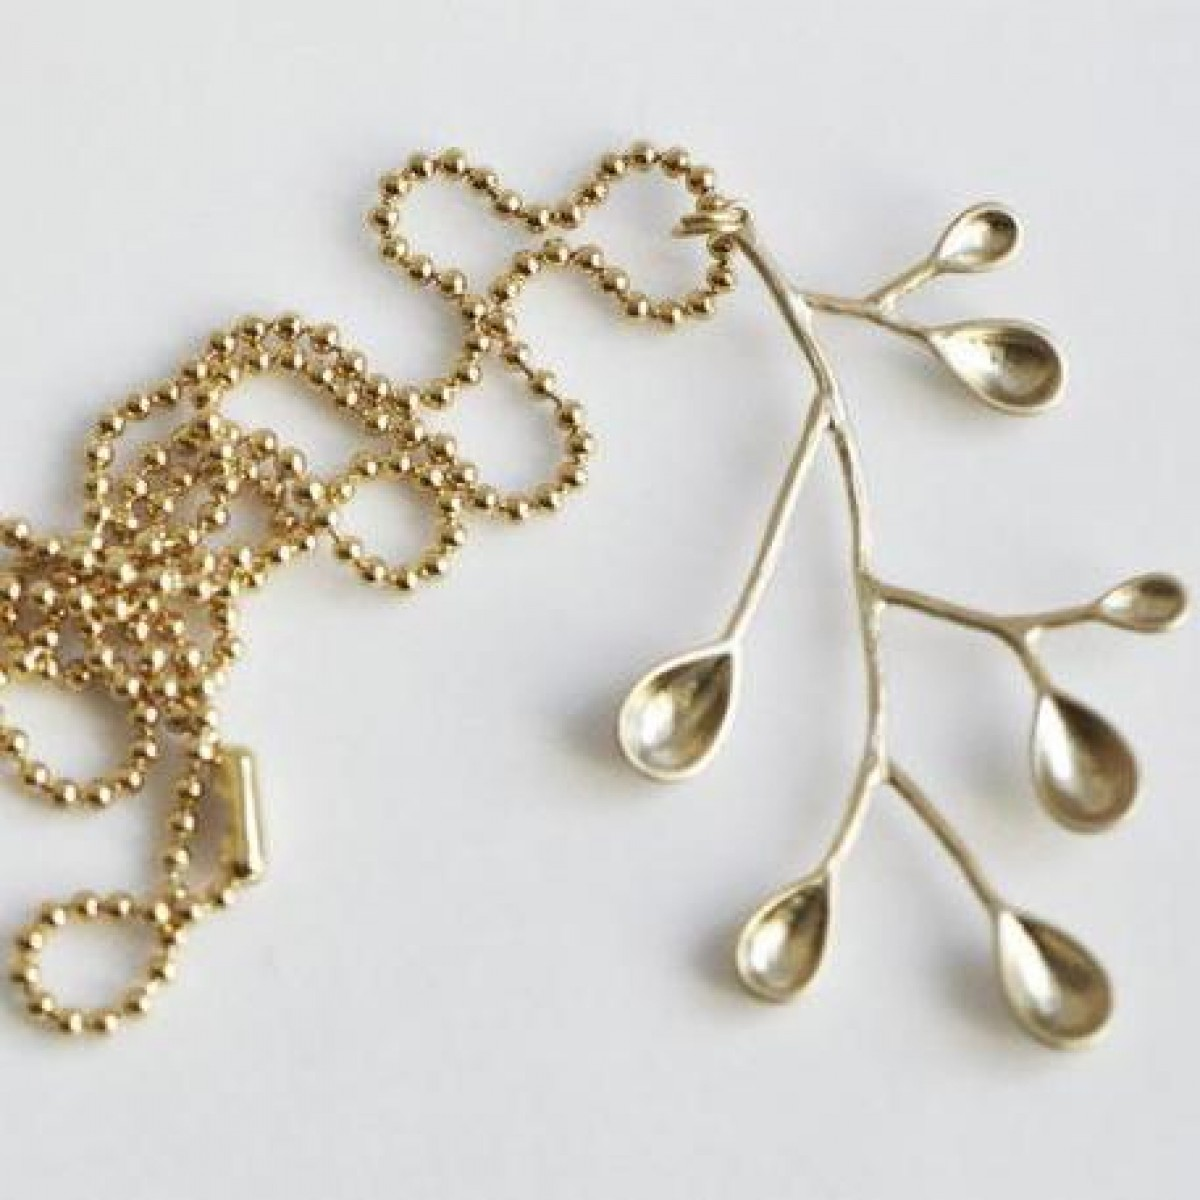 "nahili KETTE ""lovely nature"" lang & mit grafischem Zweig Anhänger gold oder silber - farben"